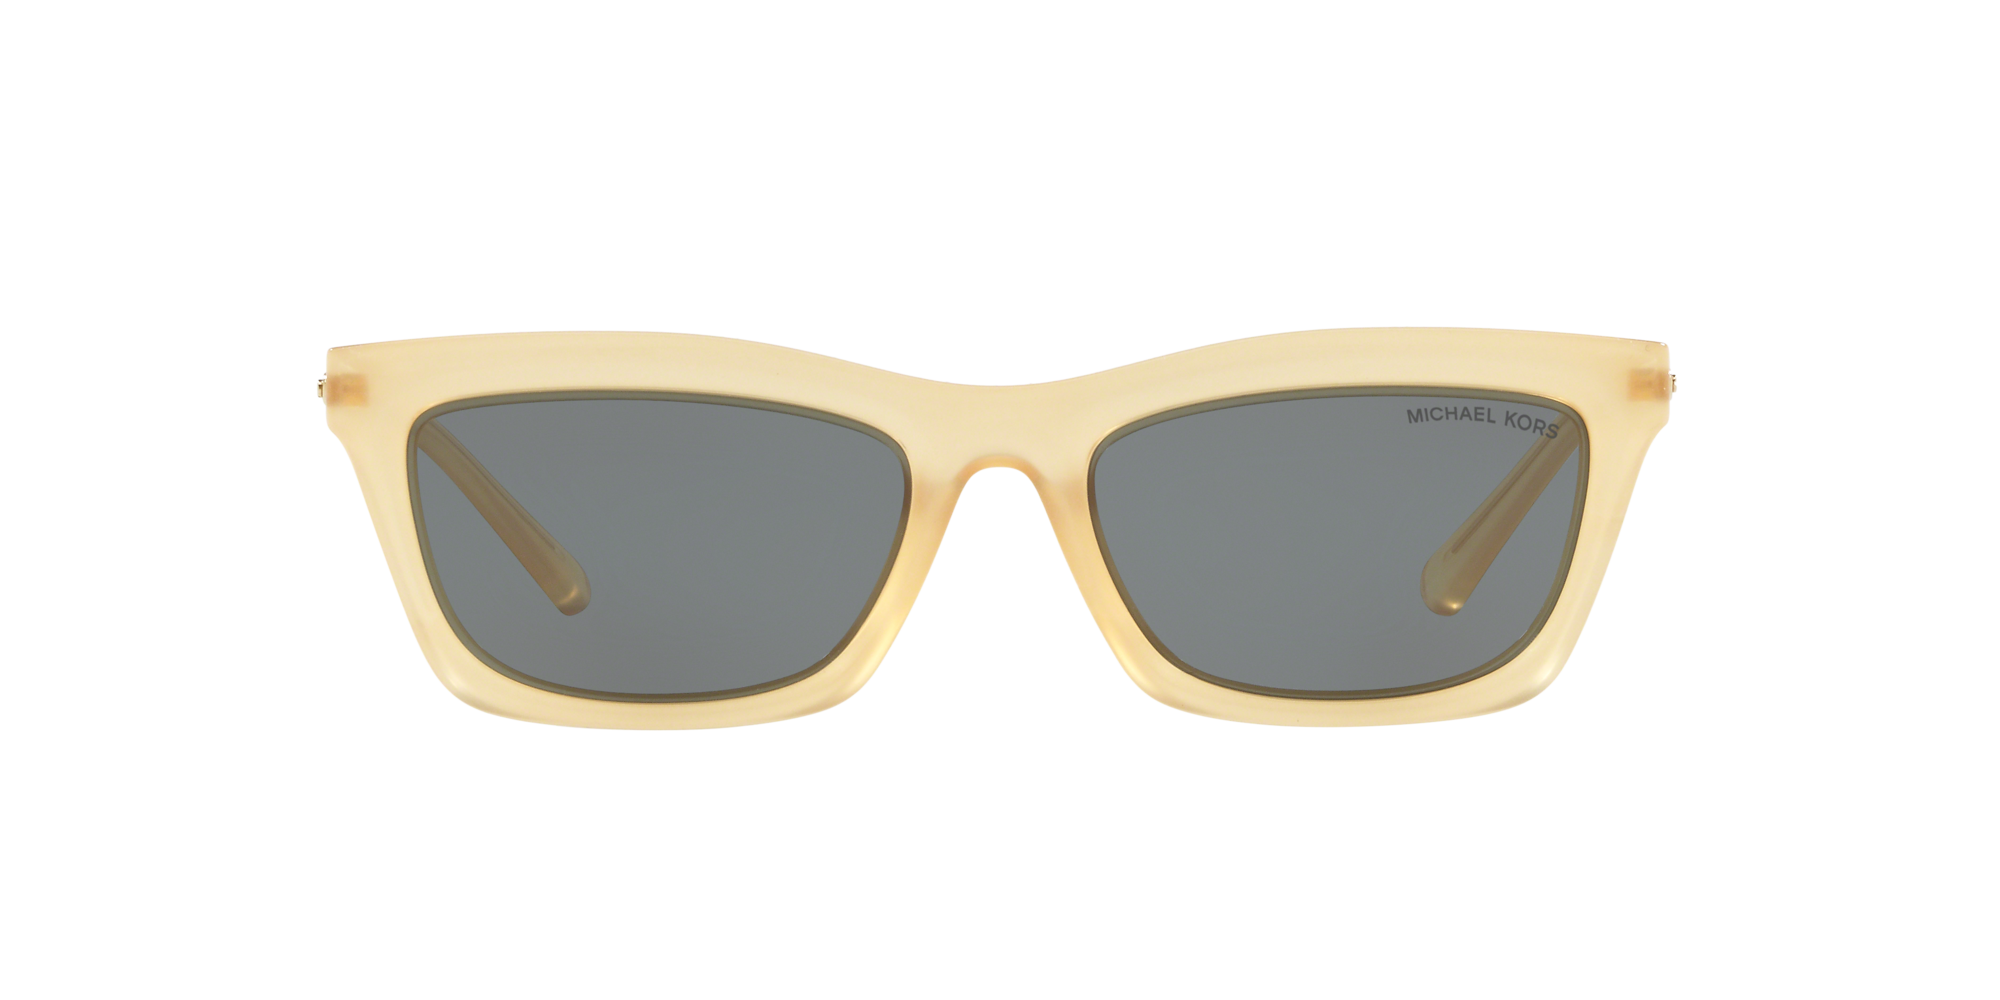 Image for MK2087U 54 STOWE from LensCrafters | Glasses, Prescription Glasses Online, Eyewear